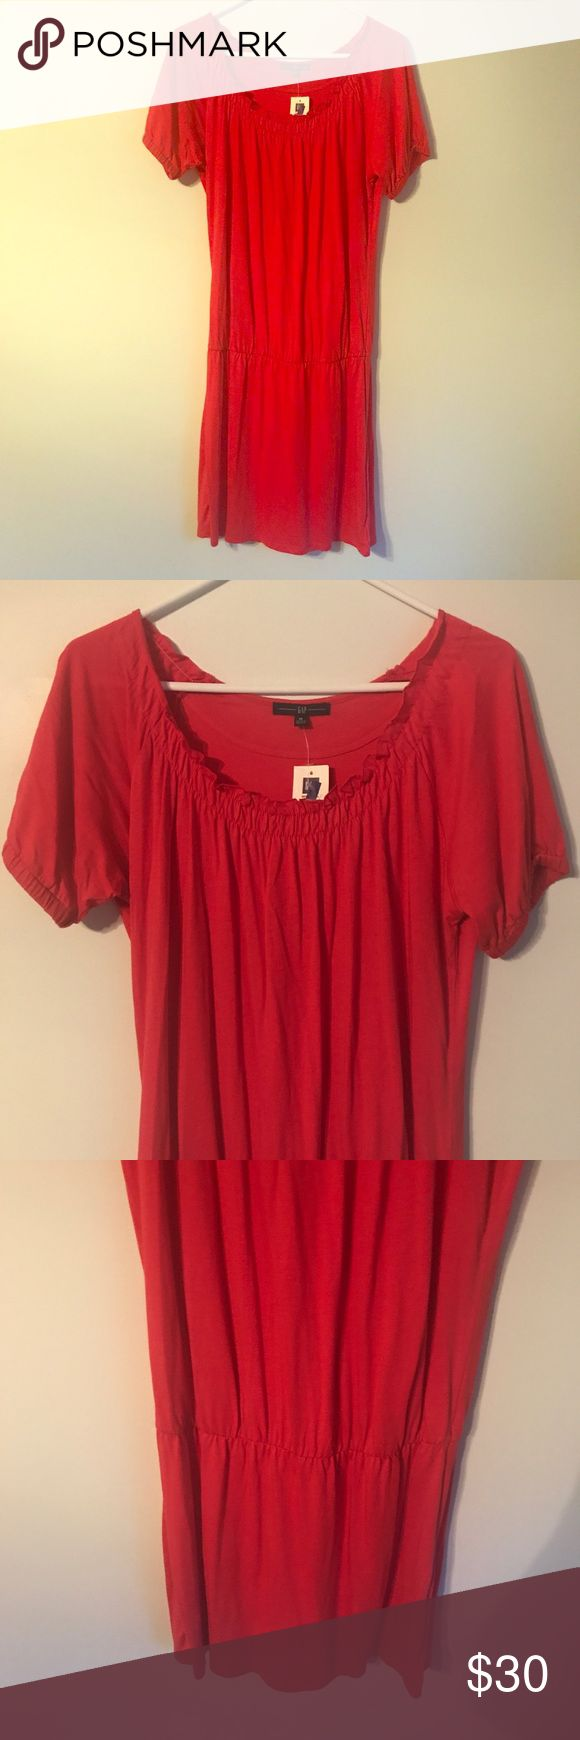 "NWT Gap Dress Medium Peasant Style Short Sleeve New with tags. Size medium. Measurements taken laid flat: bust approximately 18 1/2"", length approximately 41"" GAP Dresses Midi"